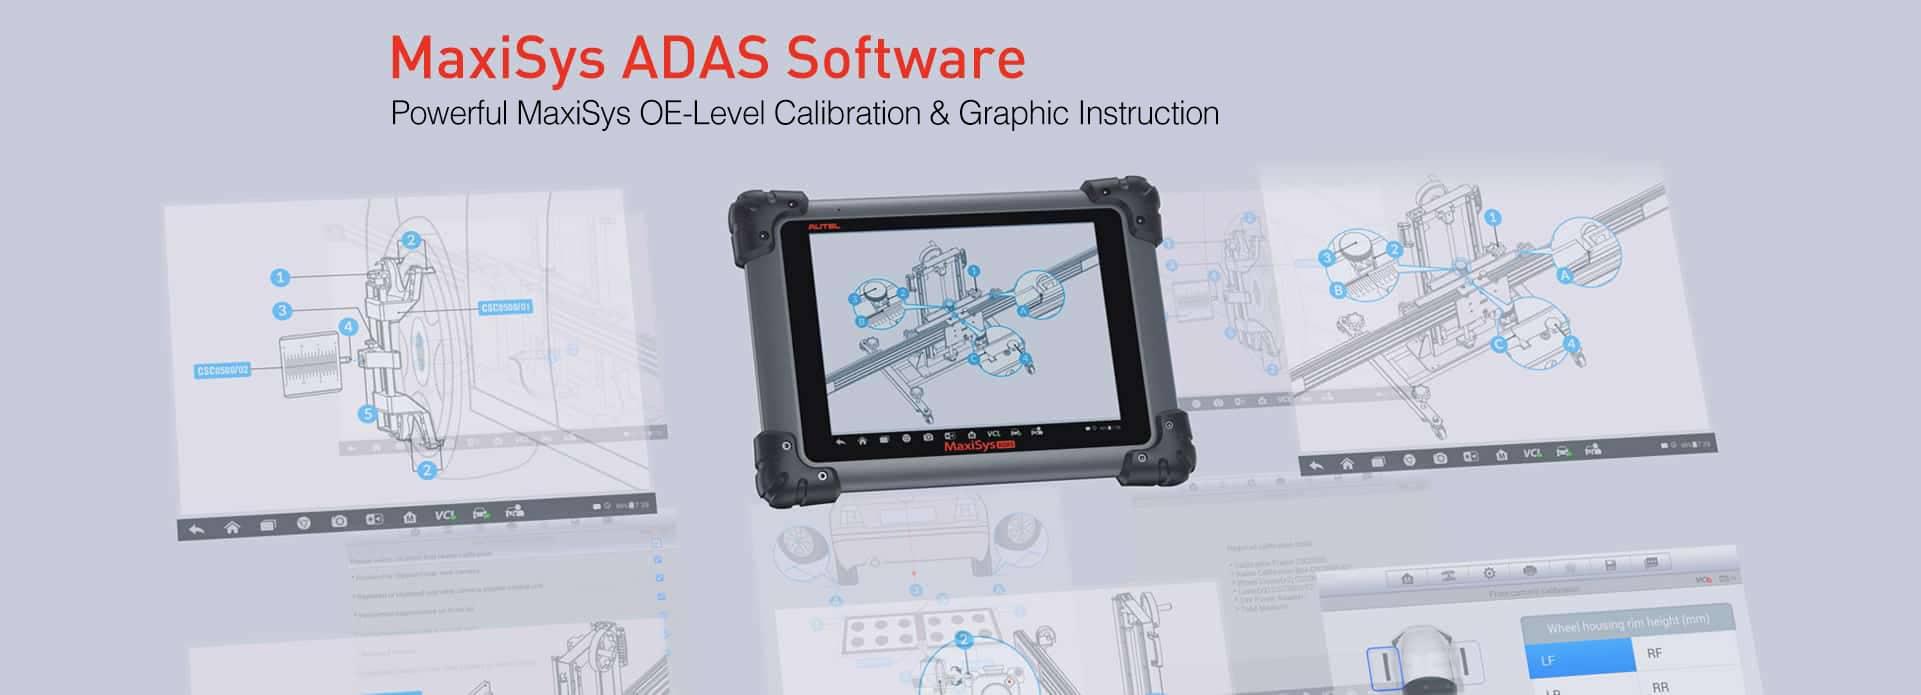 MaxiSys ADAS Software